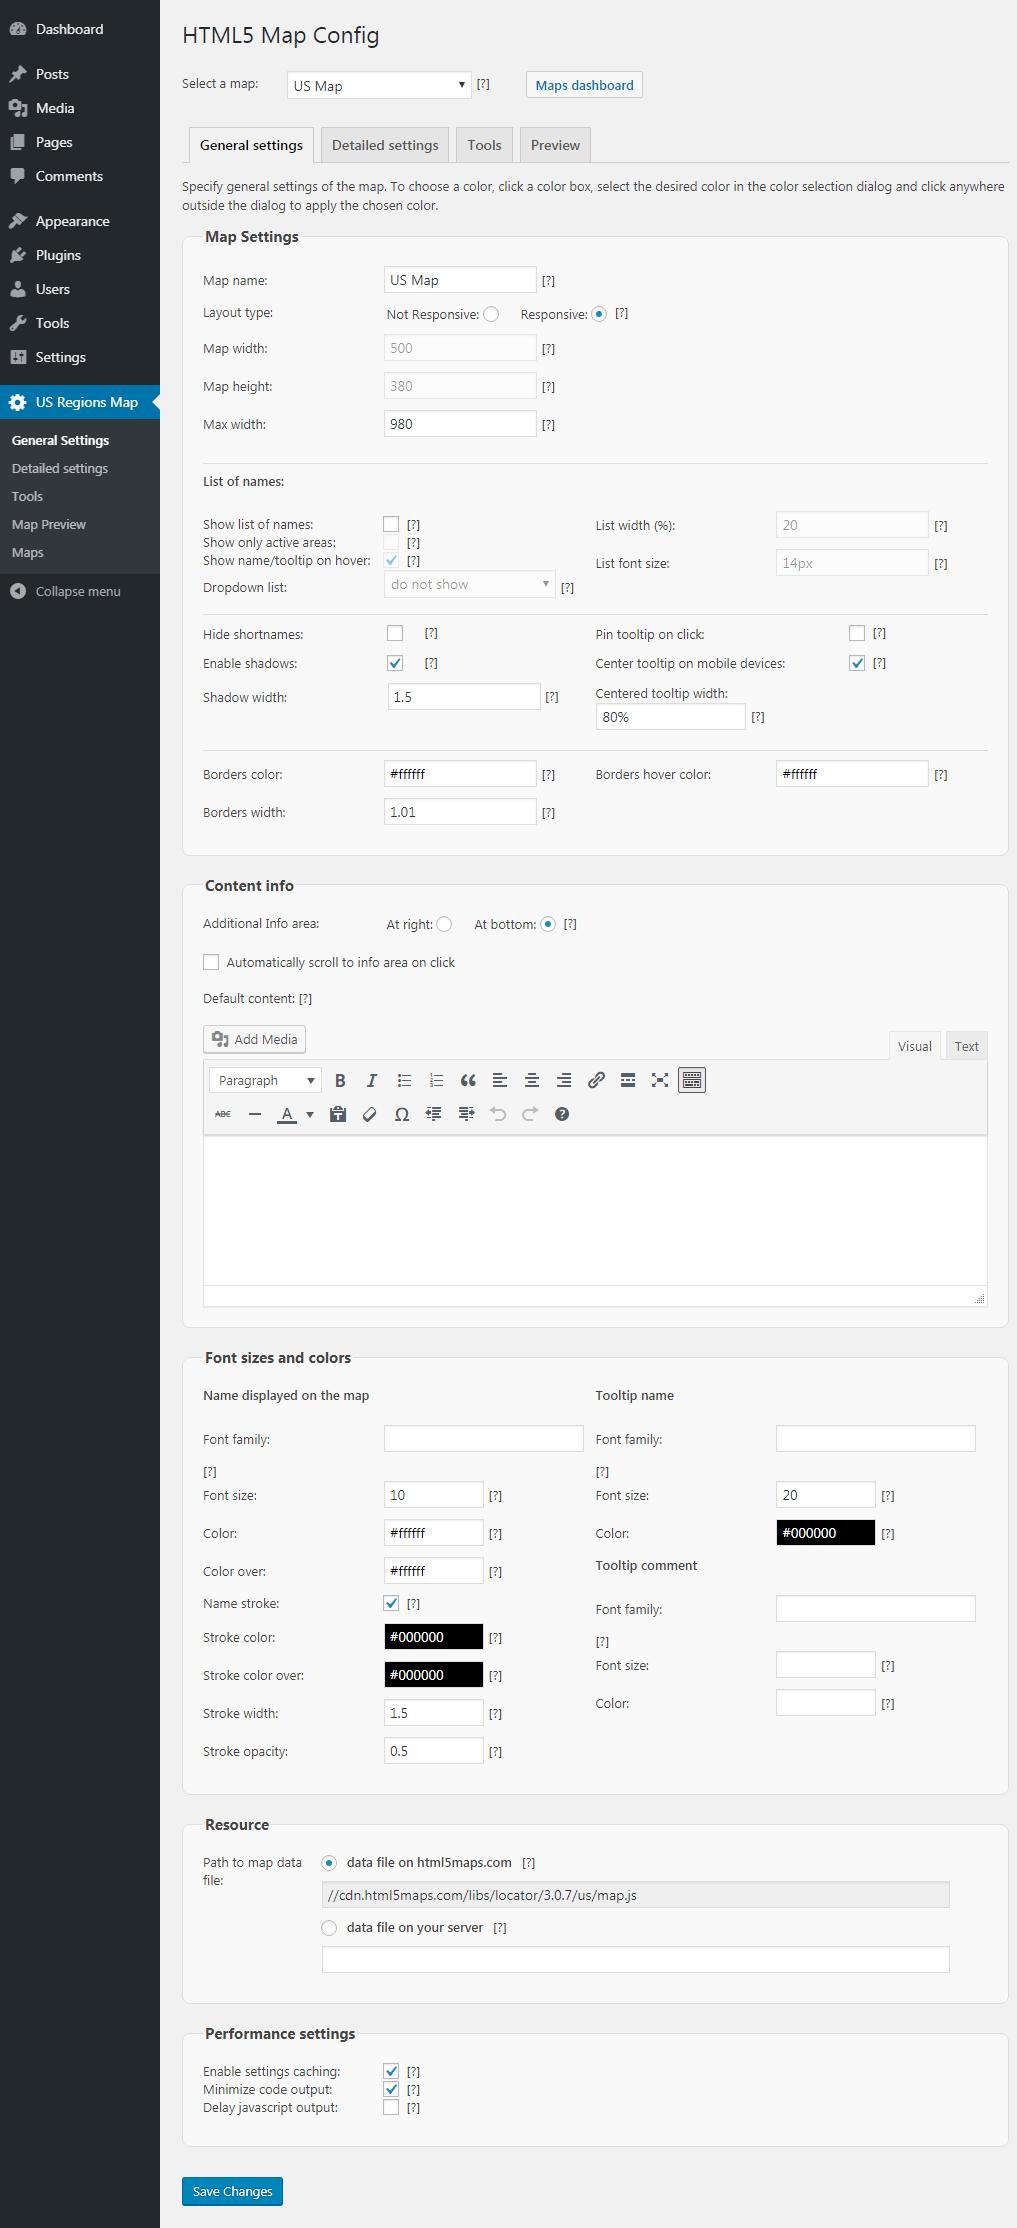 Basic map settings